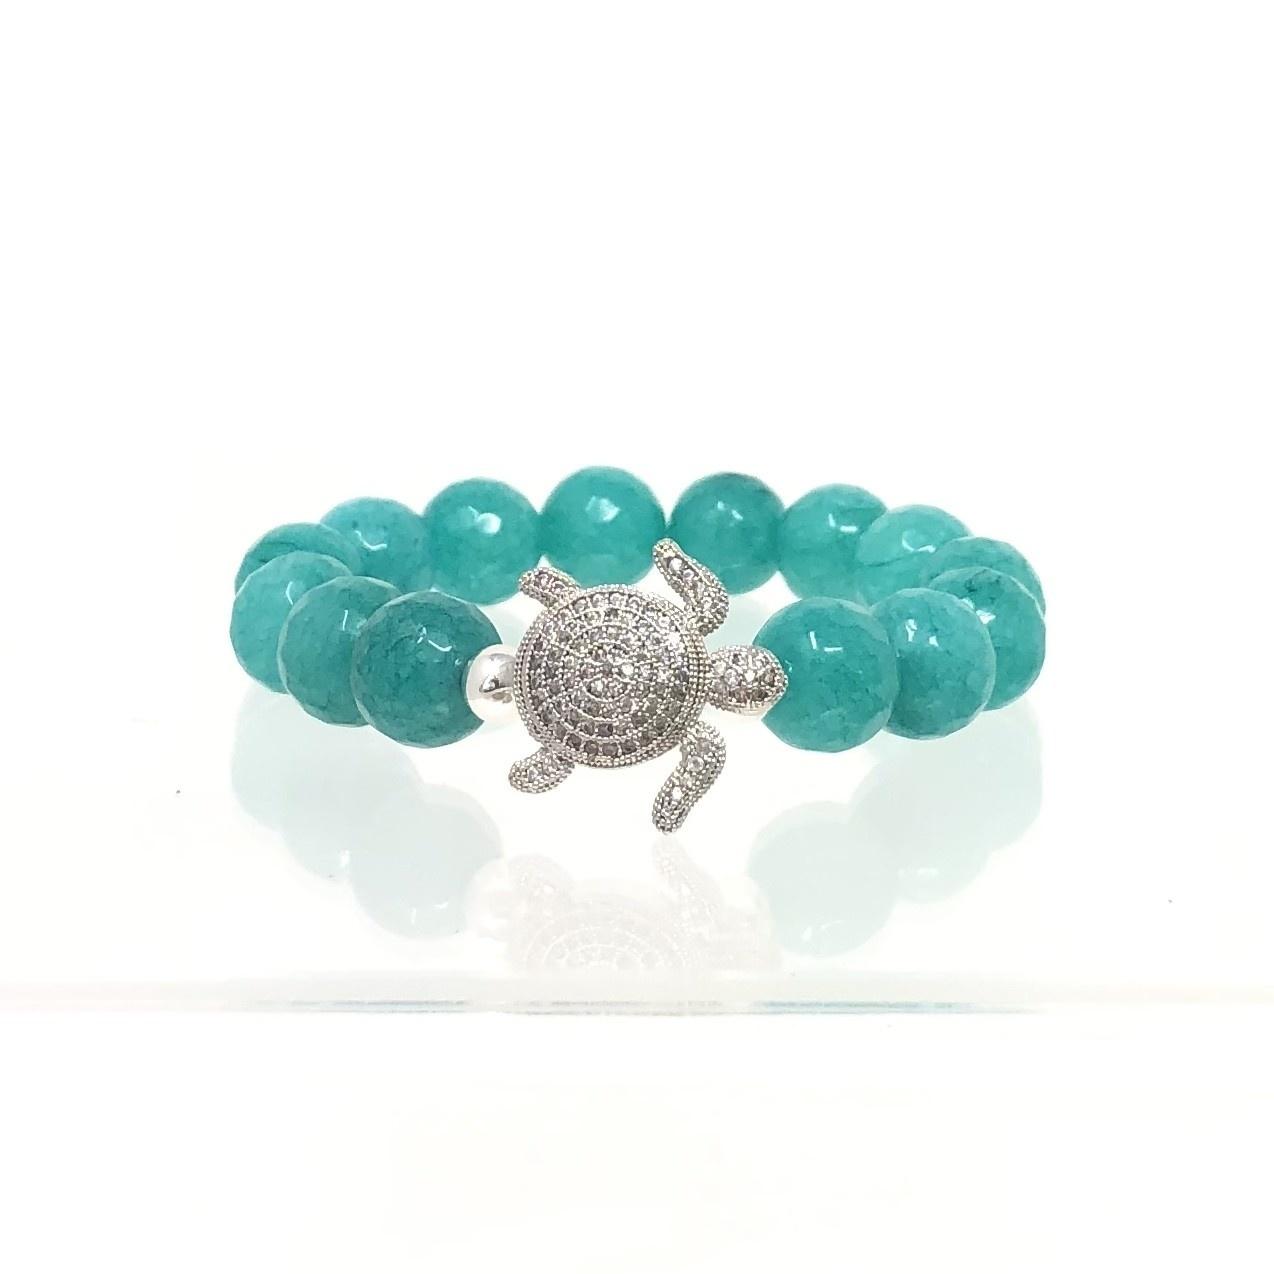 CZ Turtle & Teal Agate Bracelet